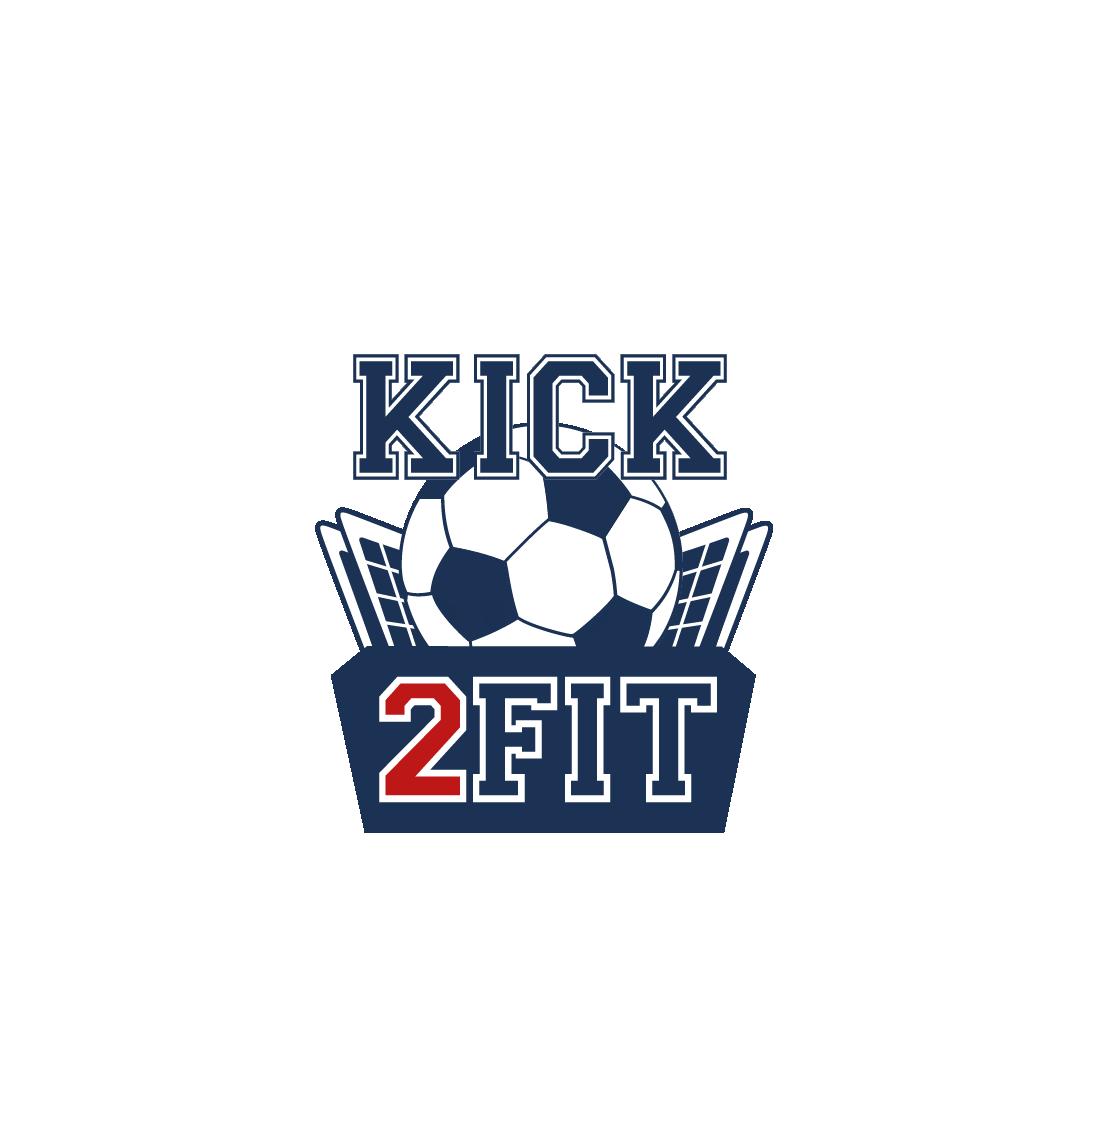 Kick 2 Fit